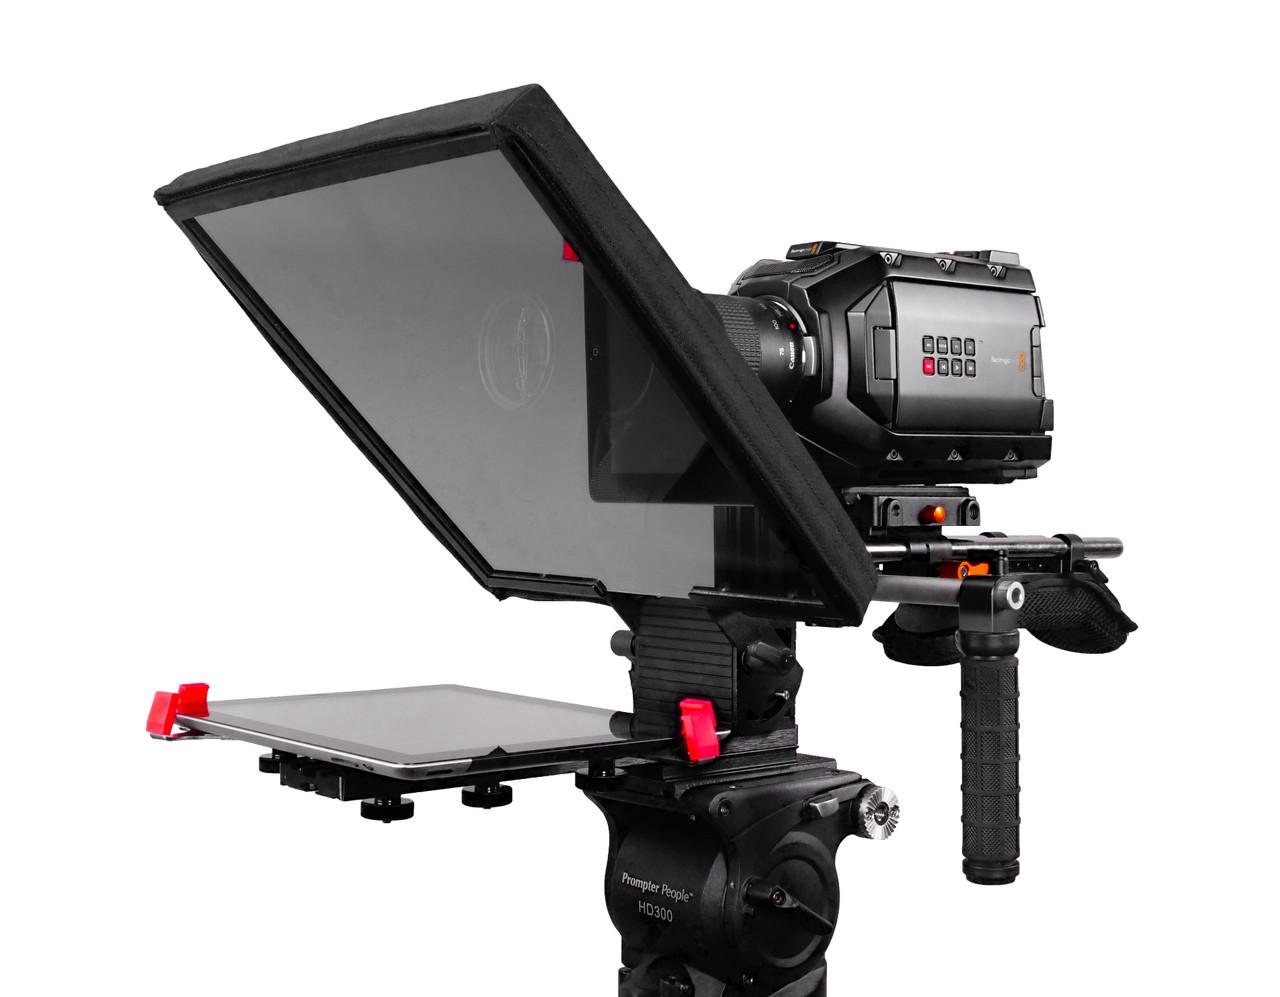 UltraFlex-12 15mm Rail-Mount iPad Teleprompter Model - Angled